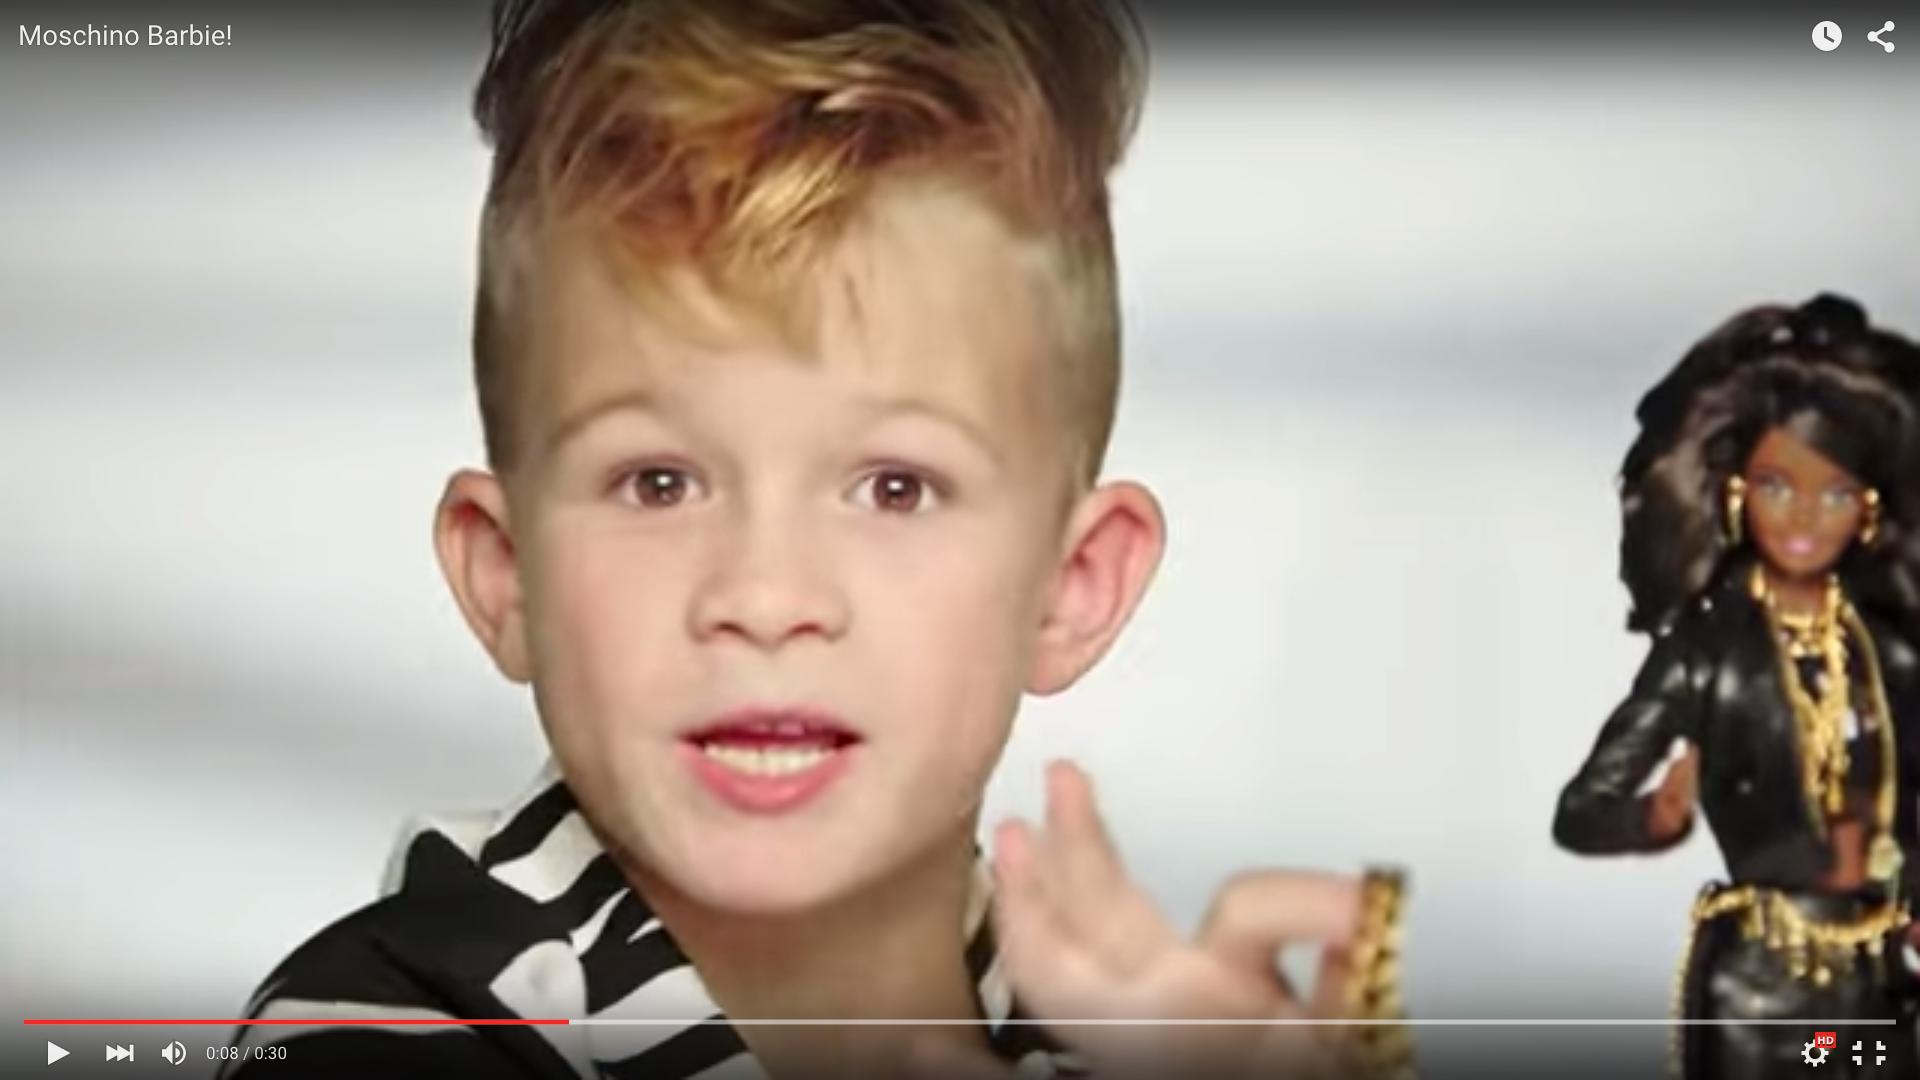 Barbies Newest Spokesperson Is A Very Enthusiastic Little Boy Quartz